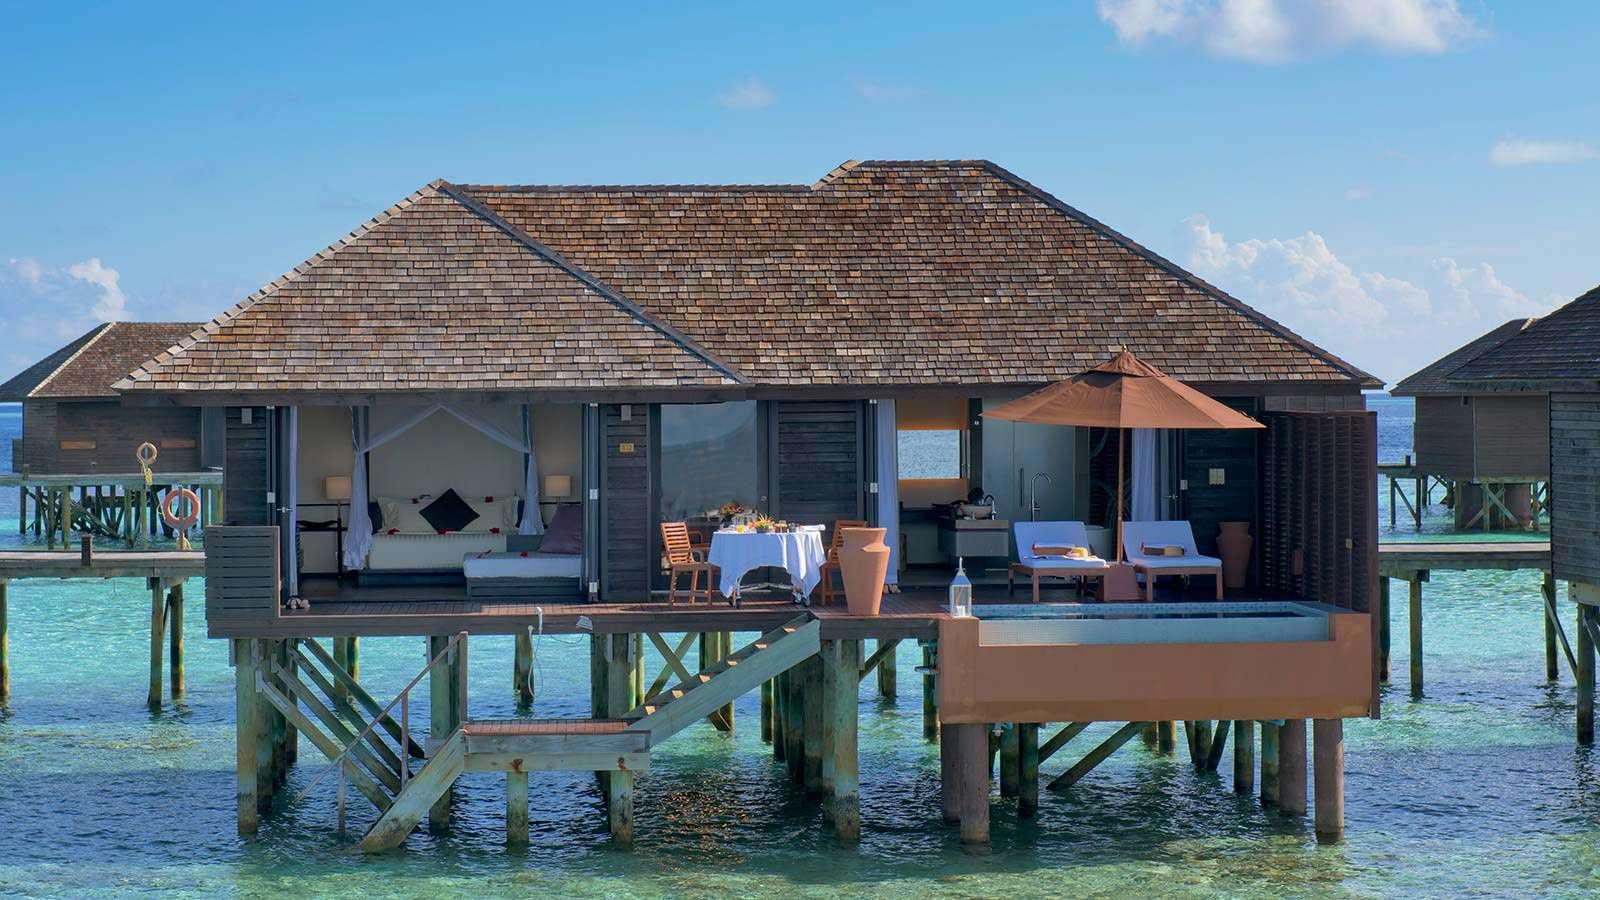 Luxury villa rentals asia - Maldives - Huvahandhoo - Lily beachresortandspa - Deluxe Water Villa - Image 1/9